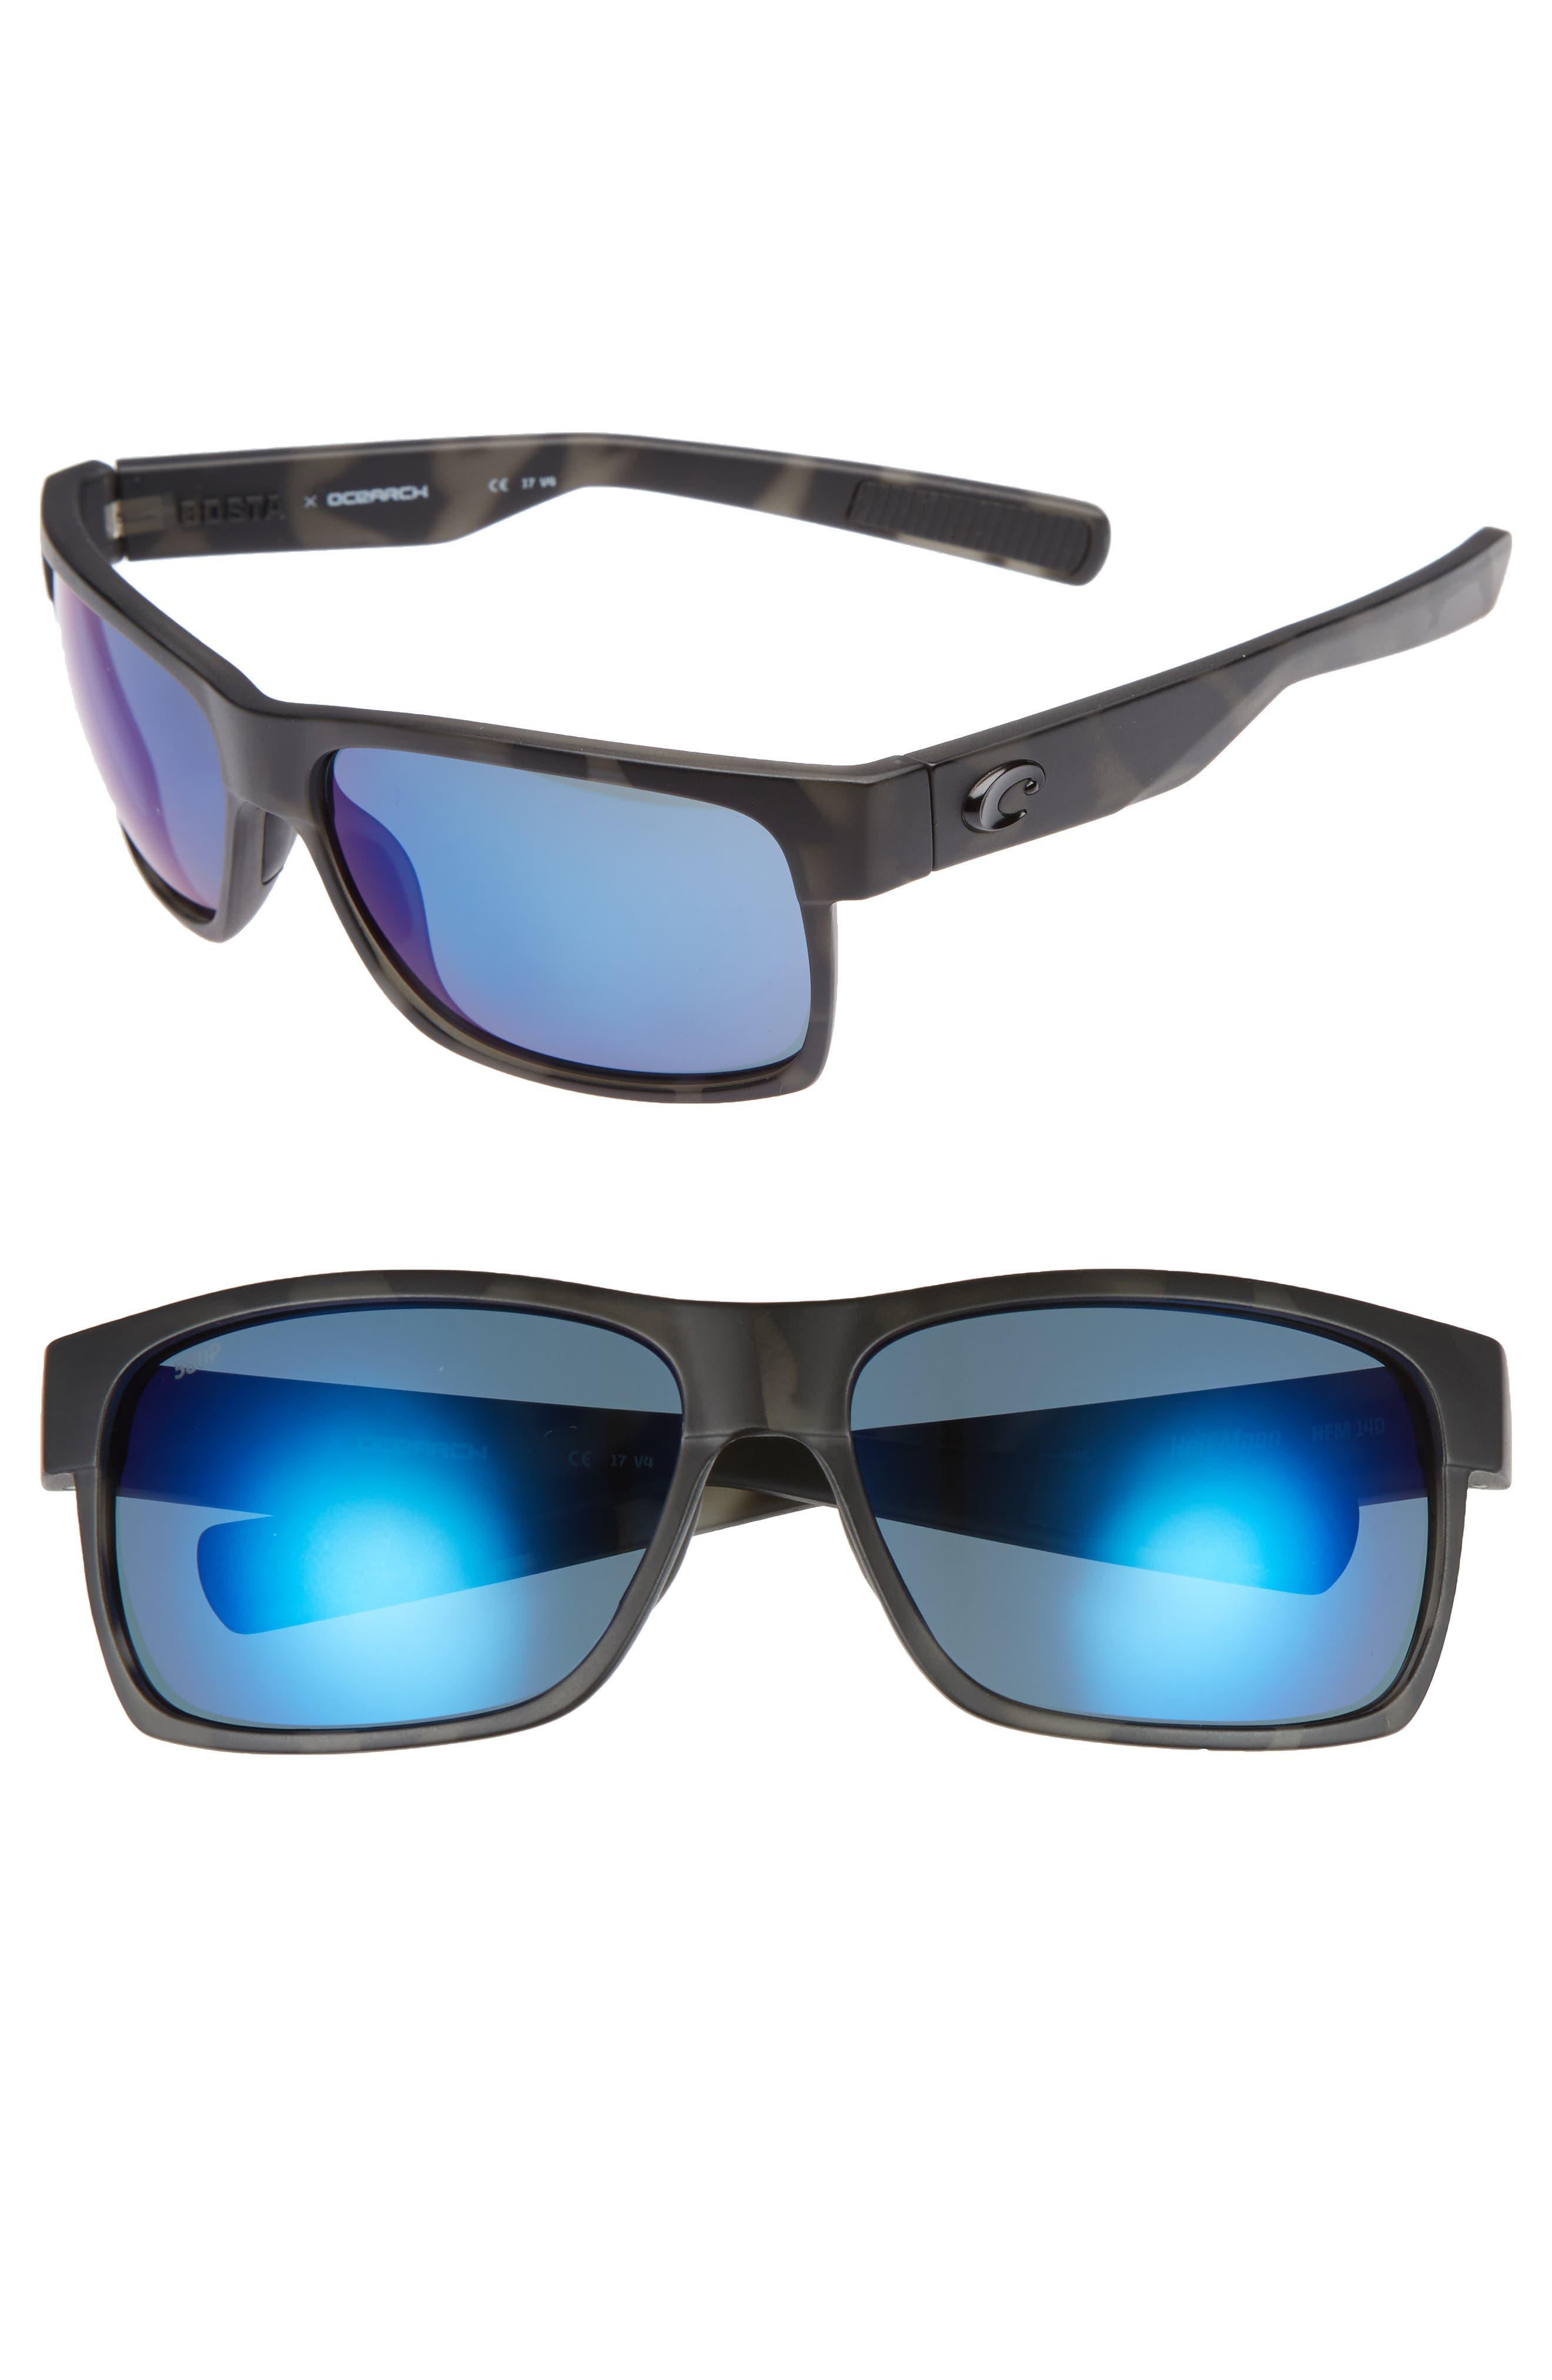 Half Moon 60mm Polarized Sunglasses,                             Main thumbnail 1, color,                             Black Tortoise/ Silver Mirror